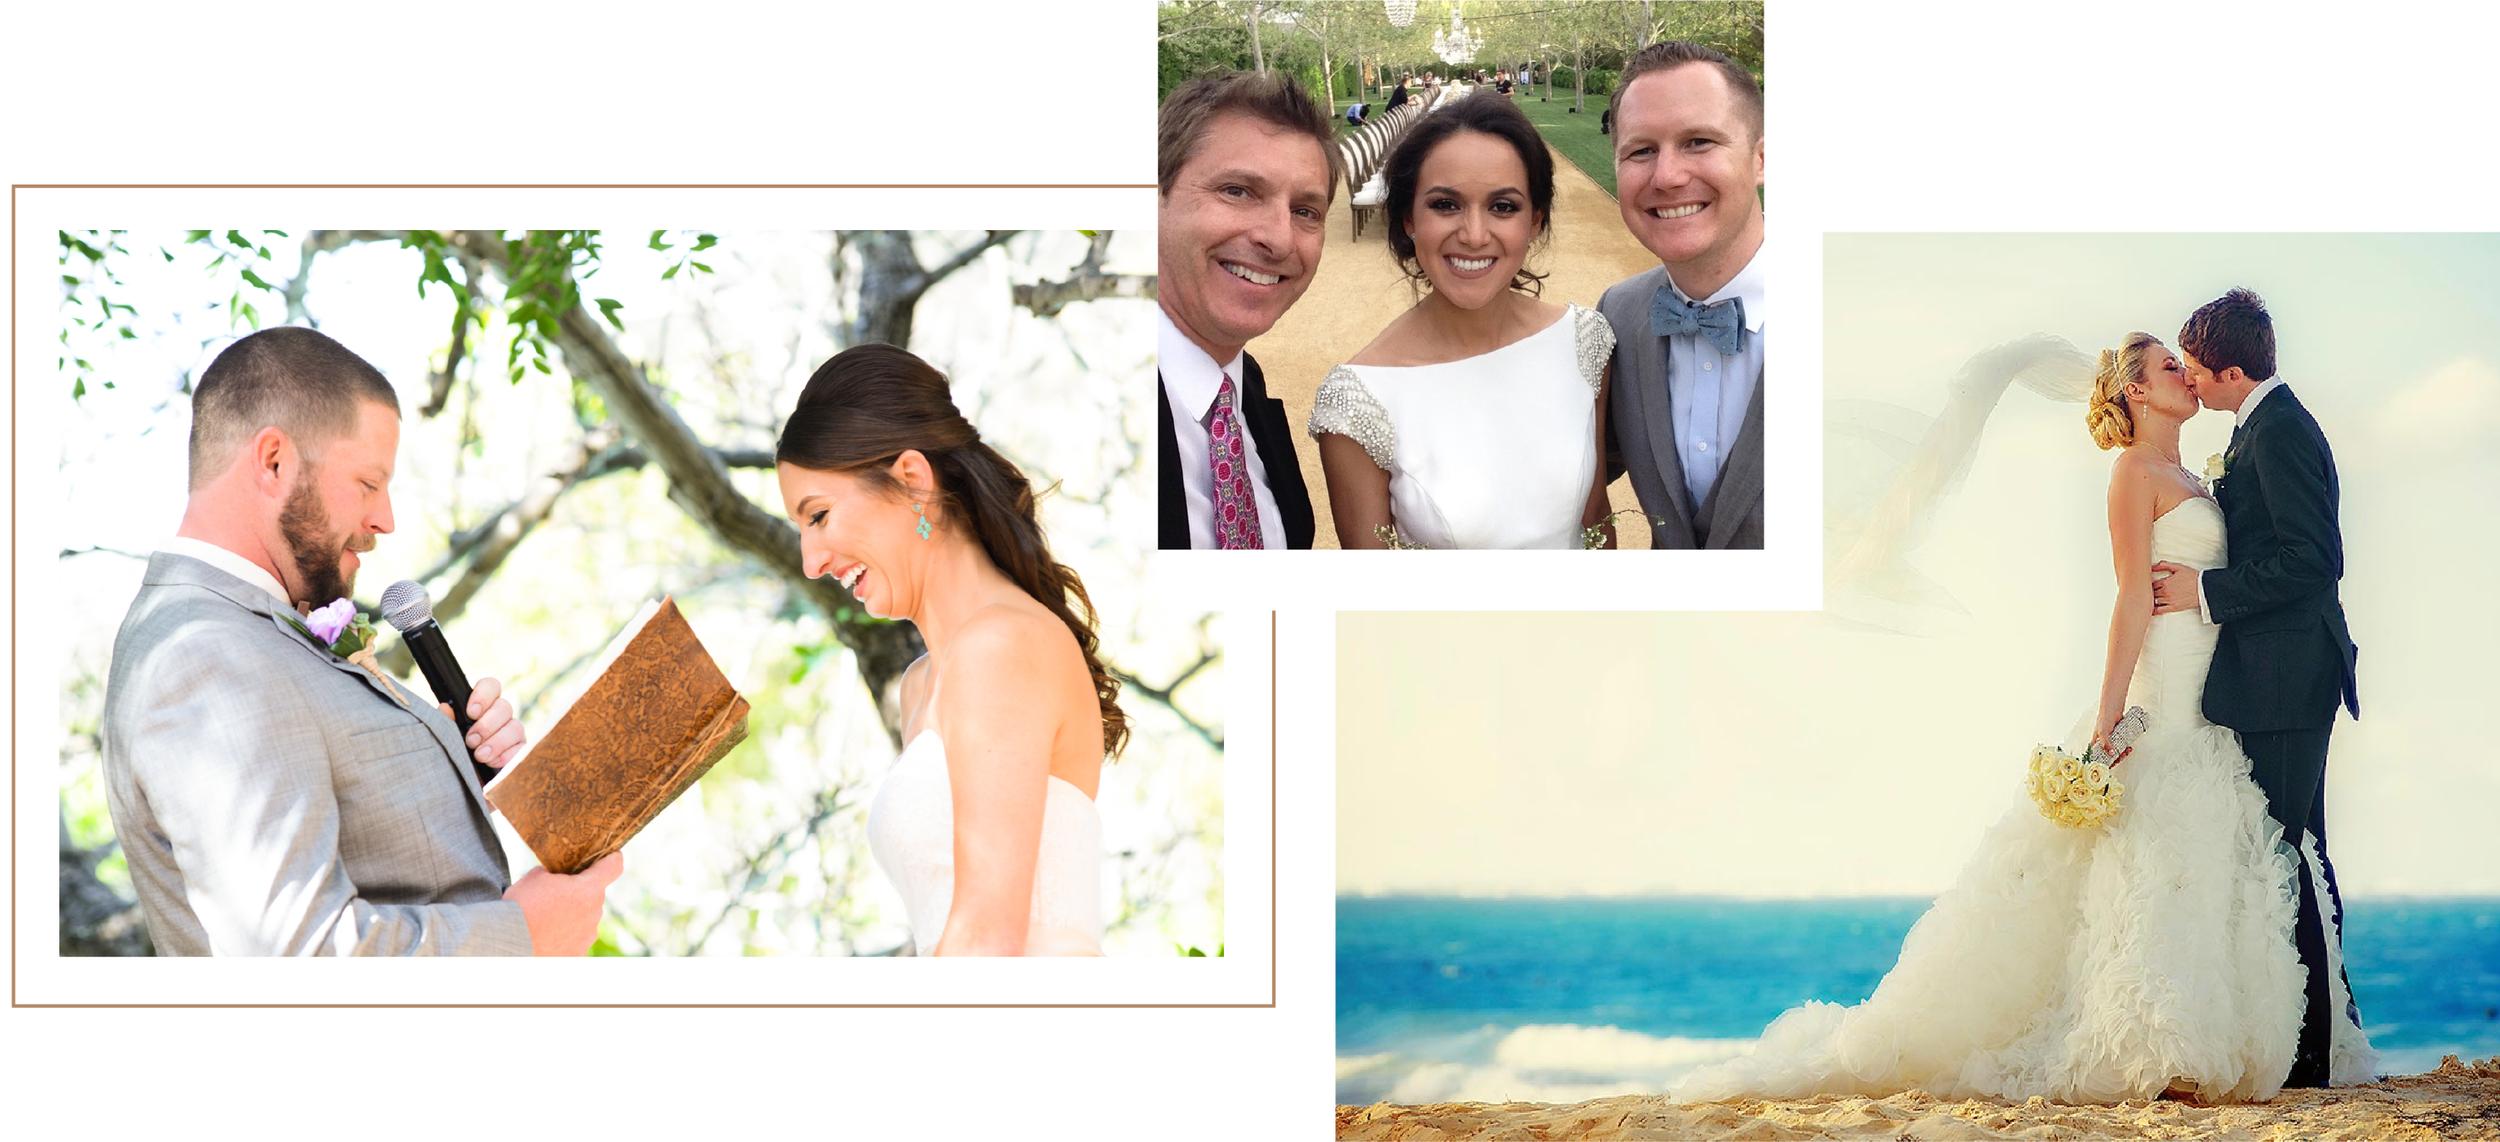 Santa Barbara Wedding DJs: Best DJs and emcees for weddings and events